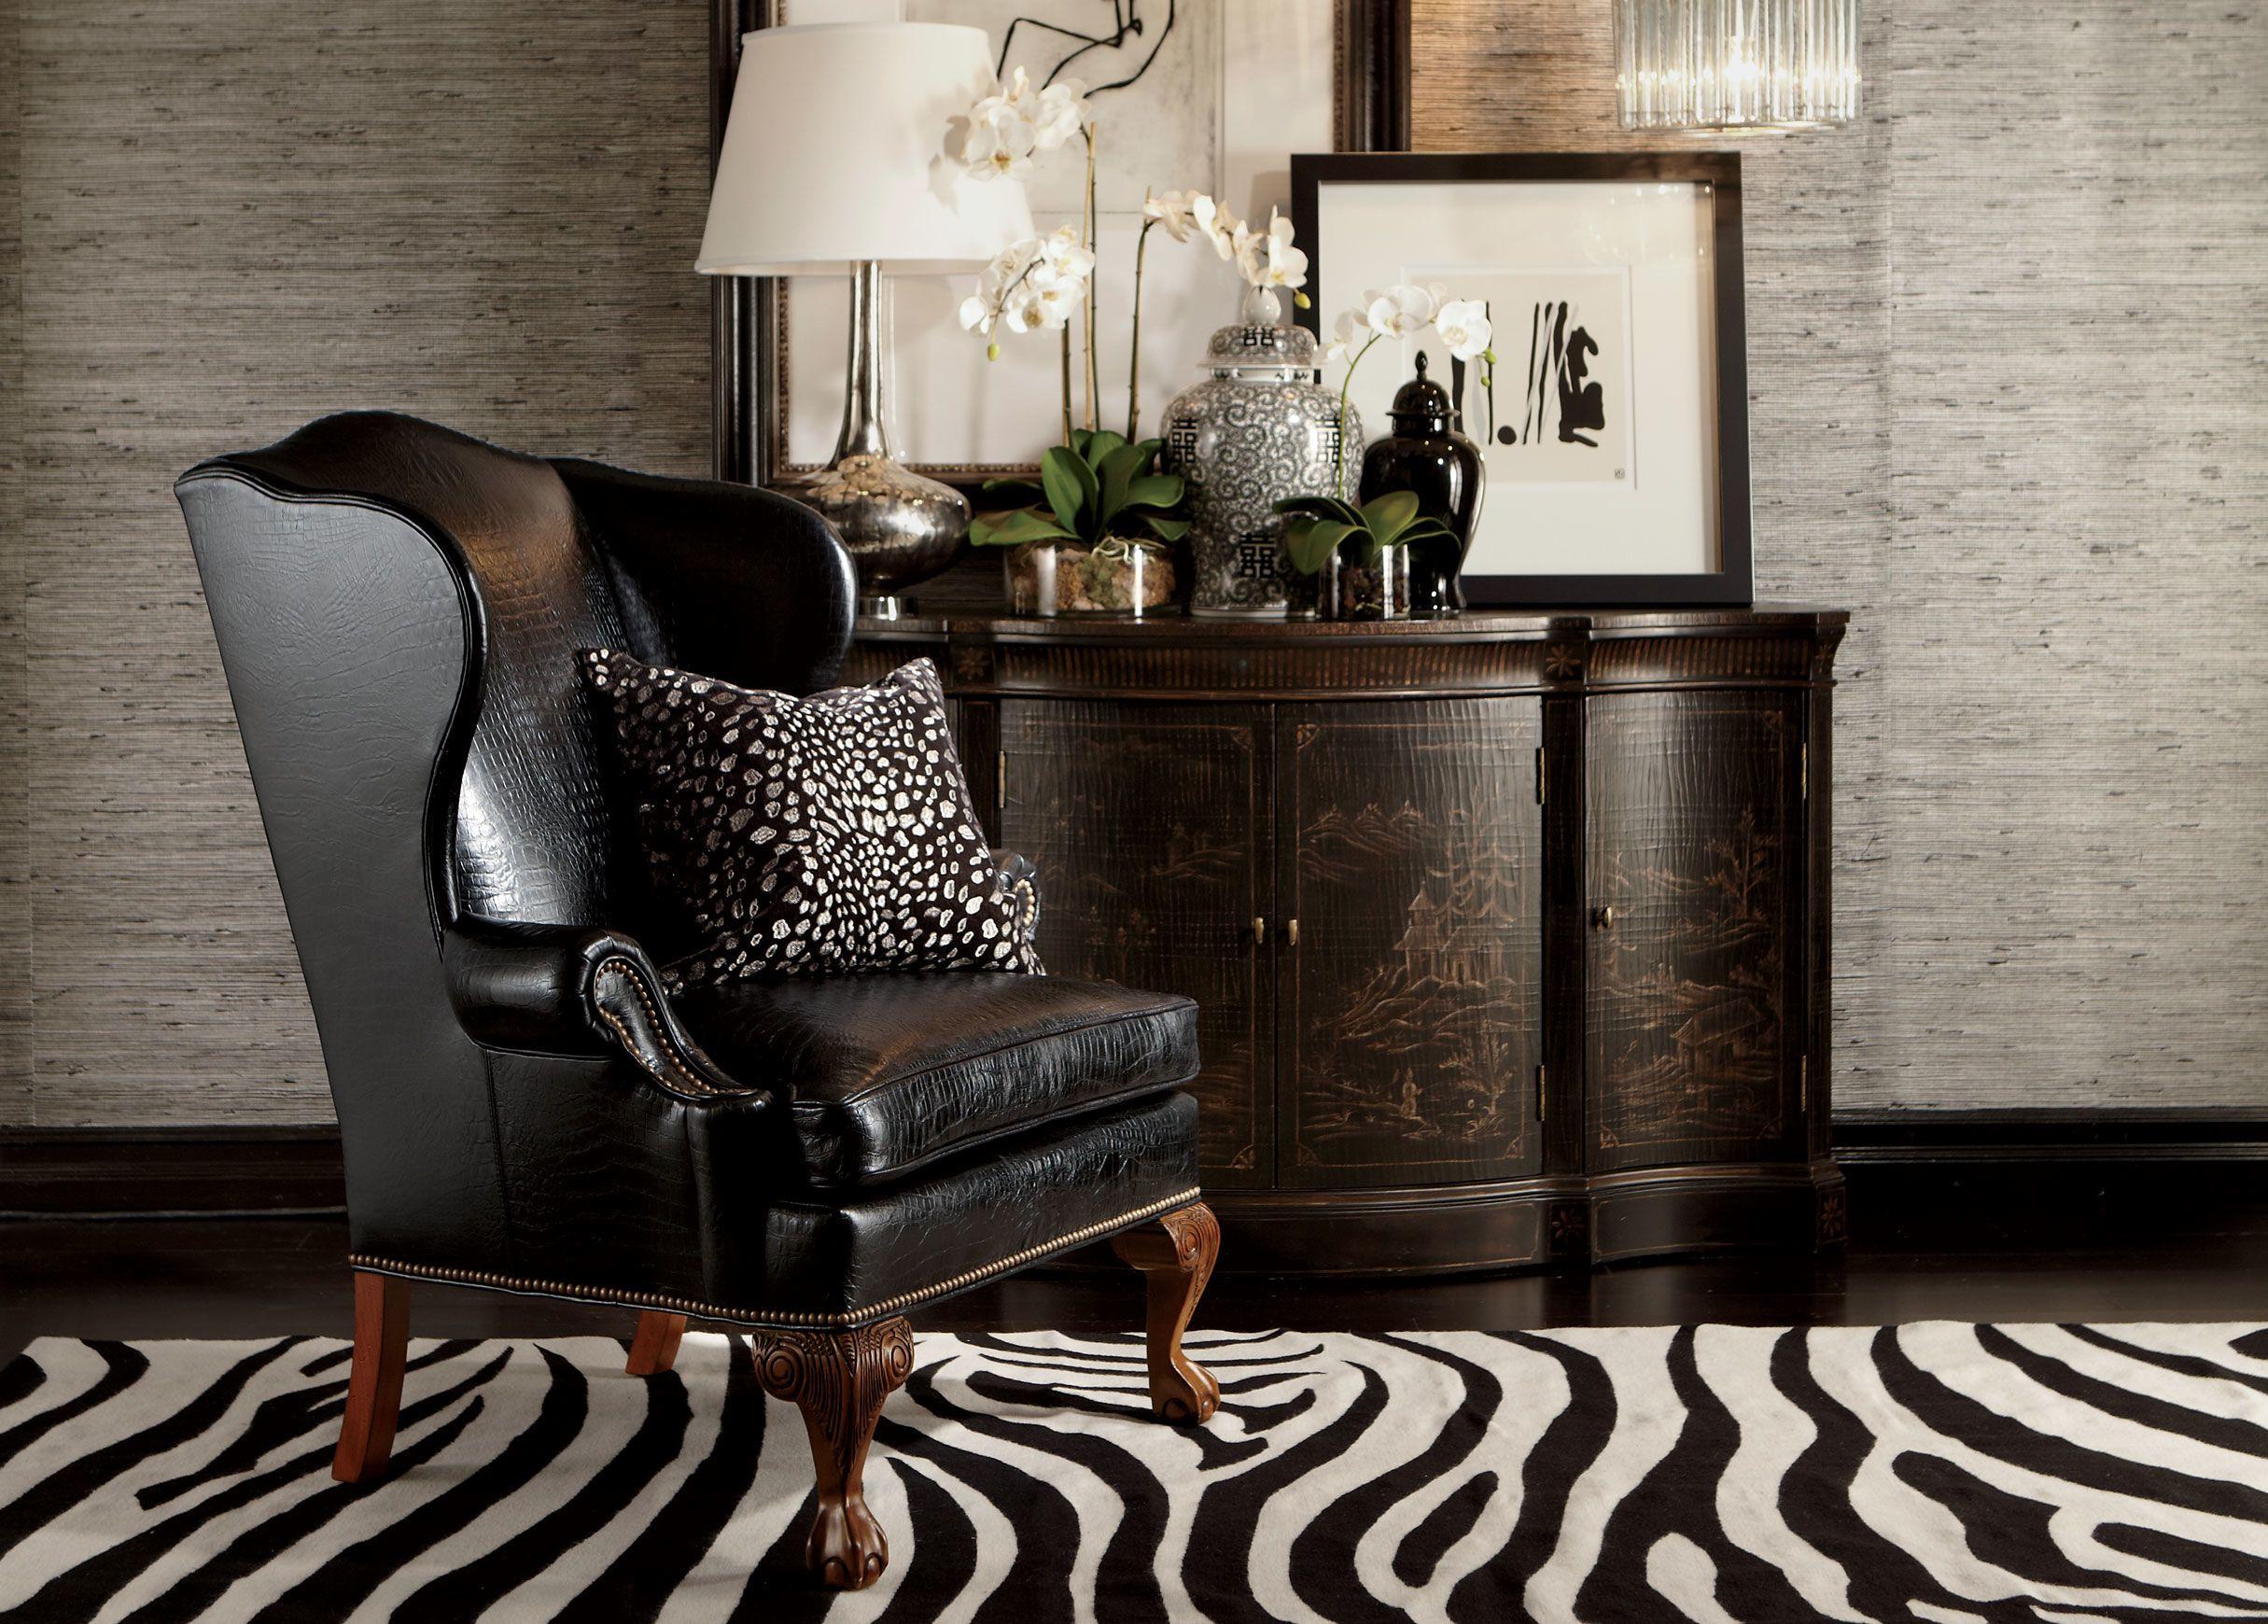 Black And White Temple Jar Home Decor Home Interior